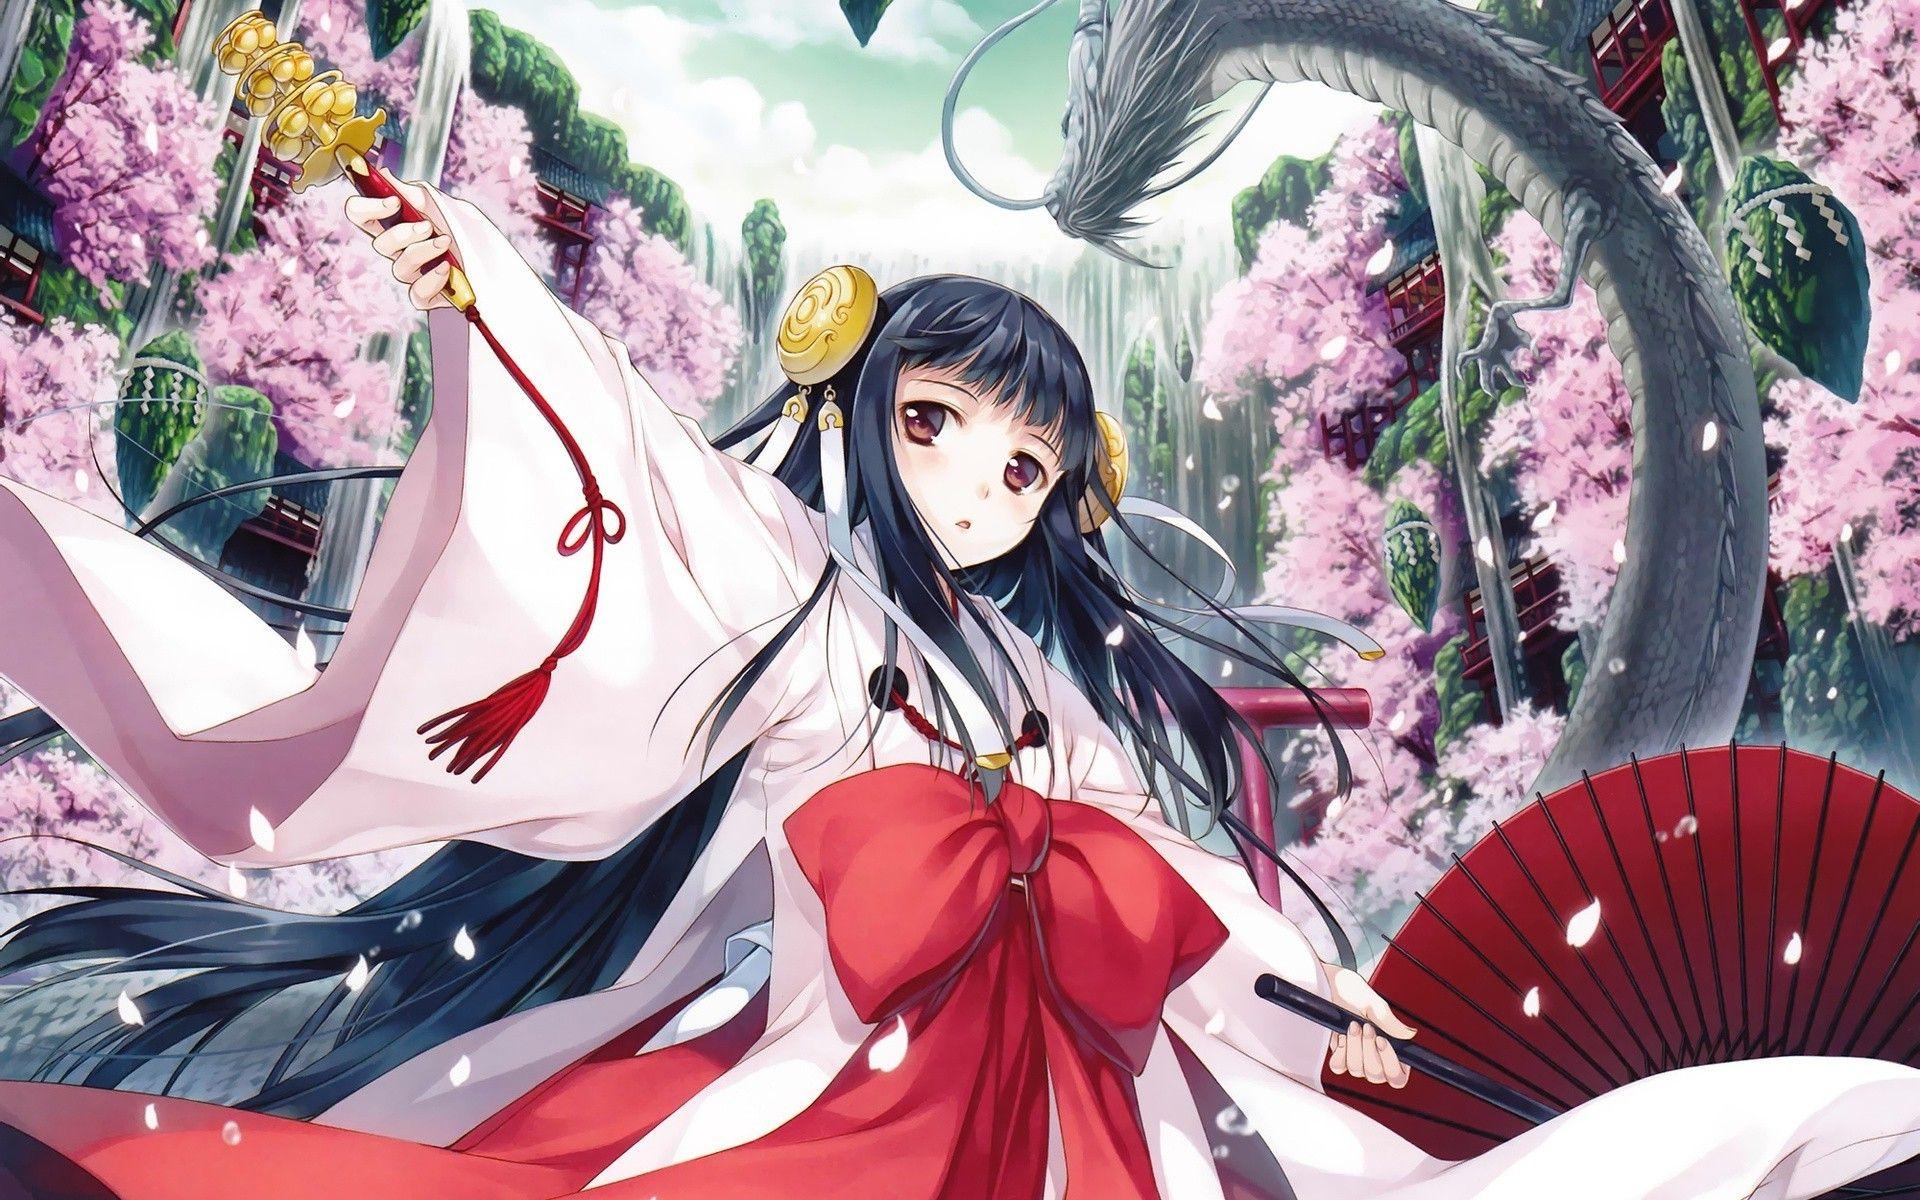 Anime Miko Dragon Cherry Blossom Anime Girls Original Characters Wallpaper Anime Kimono Anime Anime Wallpaper Download Anime wallpaper mega pack